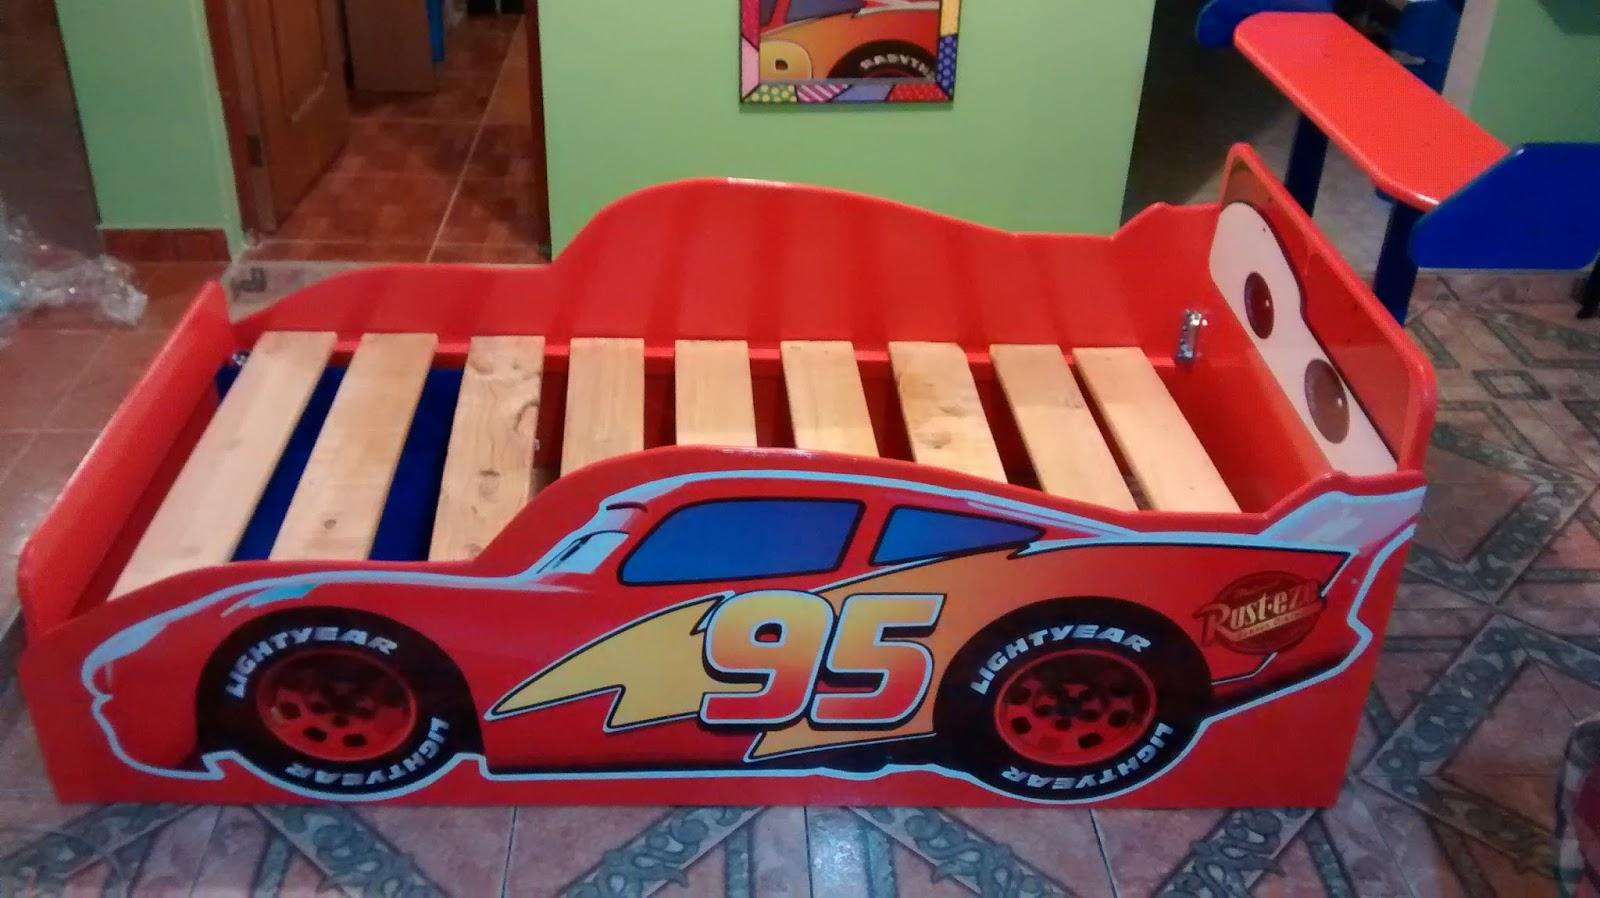 Galeria arte y dise o madekids cama infantil cars rayo mcqueen - Camas infantiles de cars ...